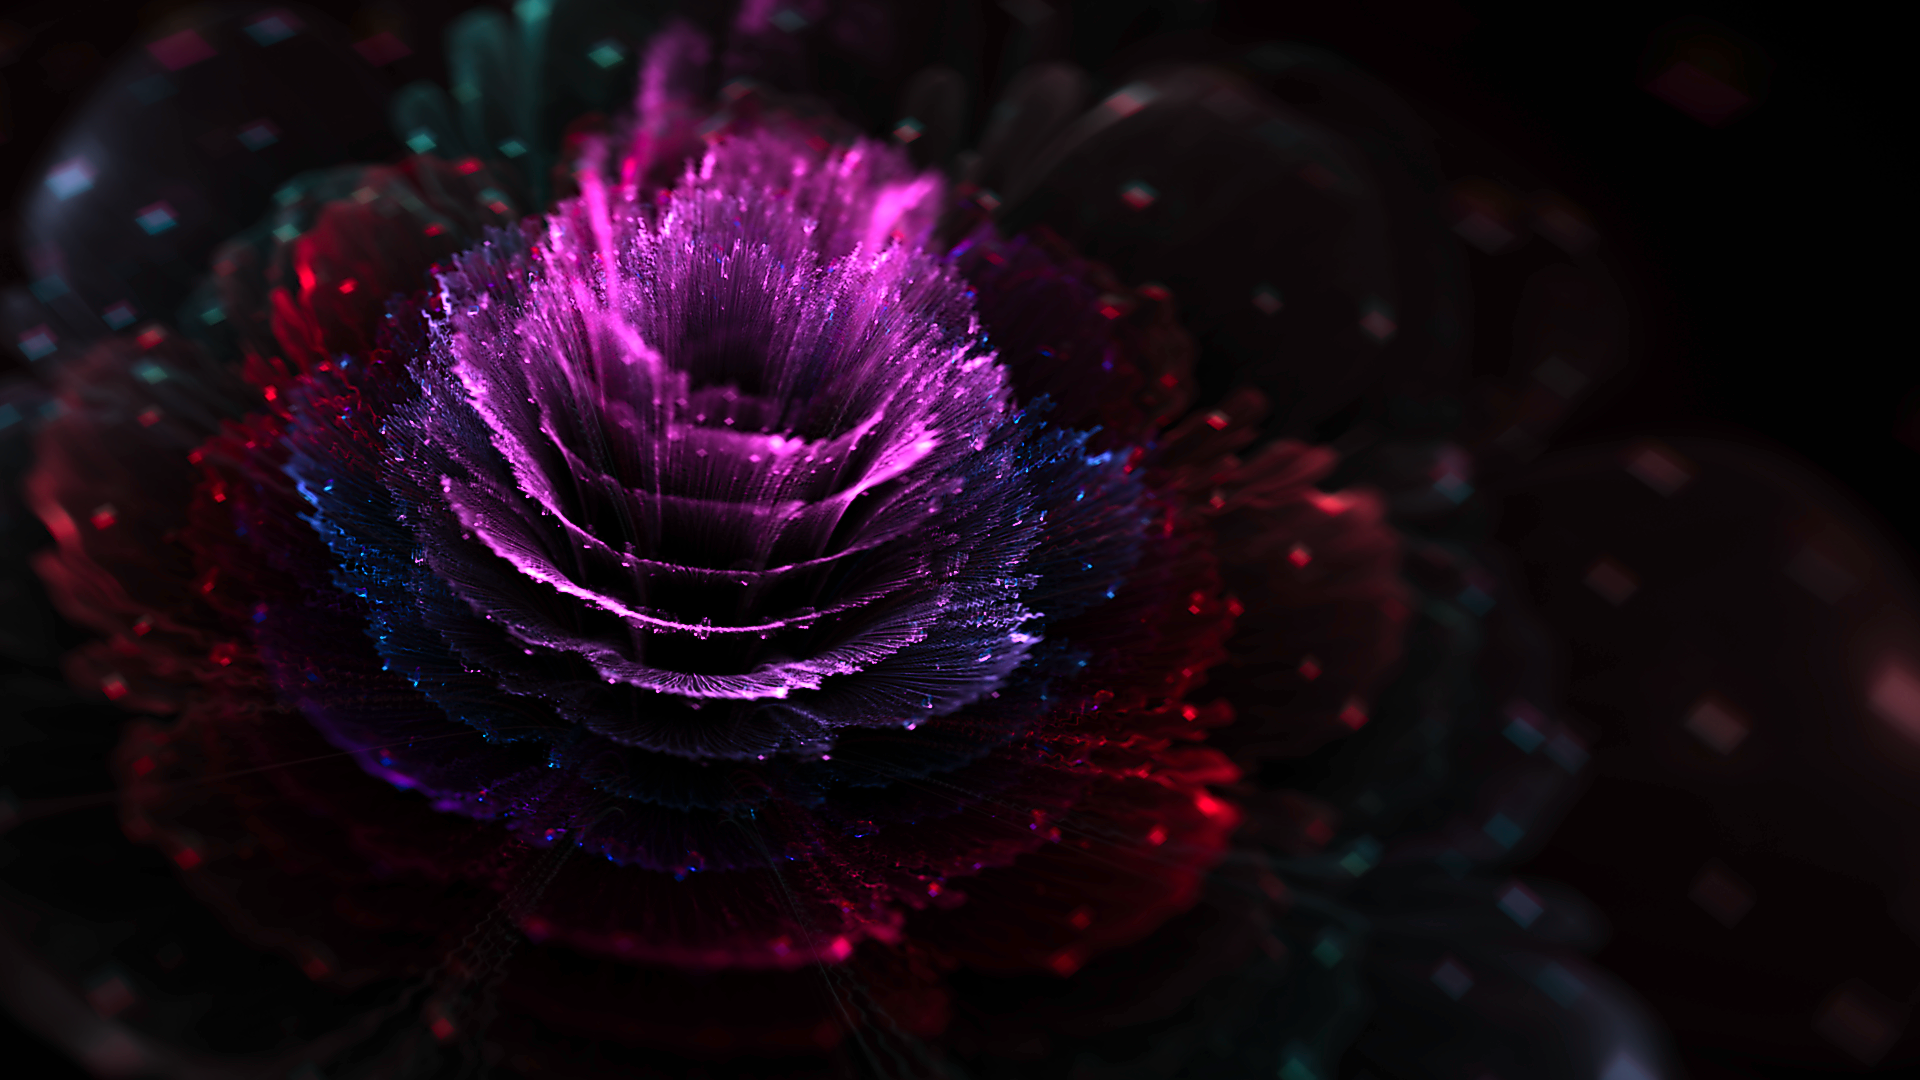 Artistic Flower Purple 1920x1080